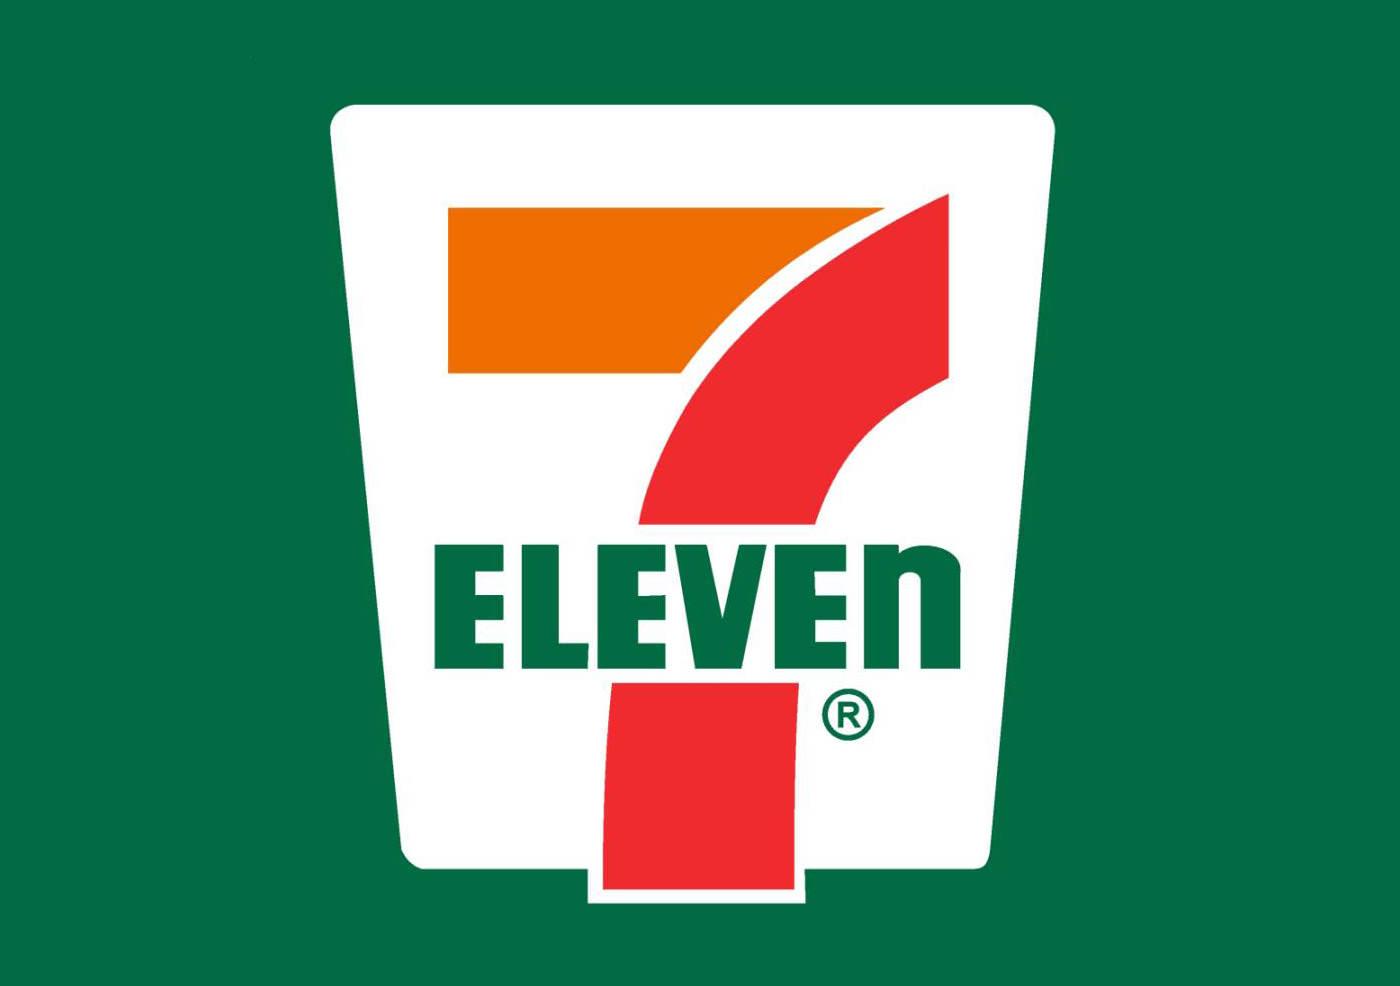 7eleven logo